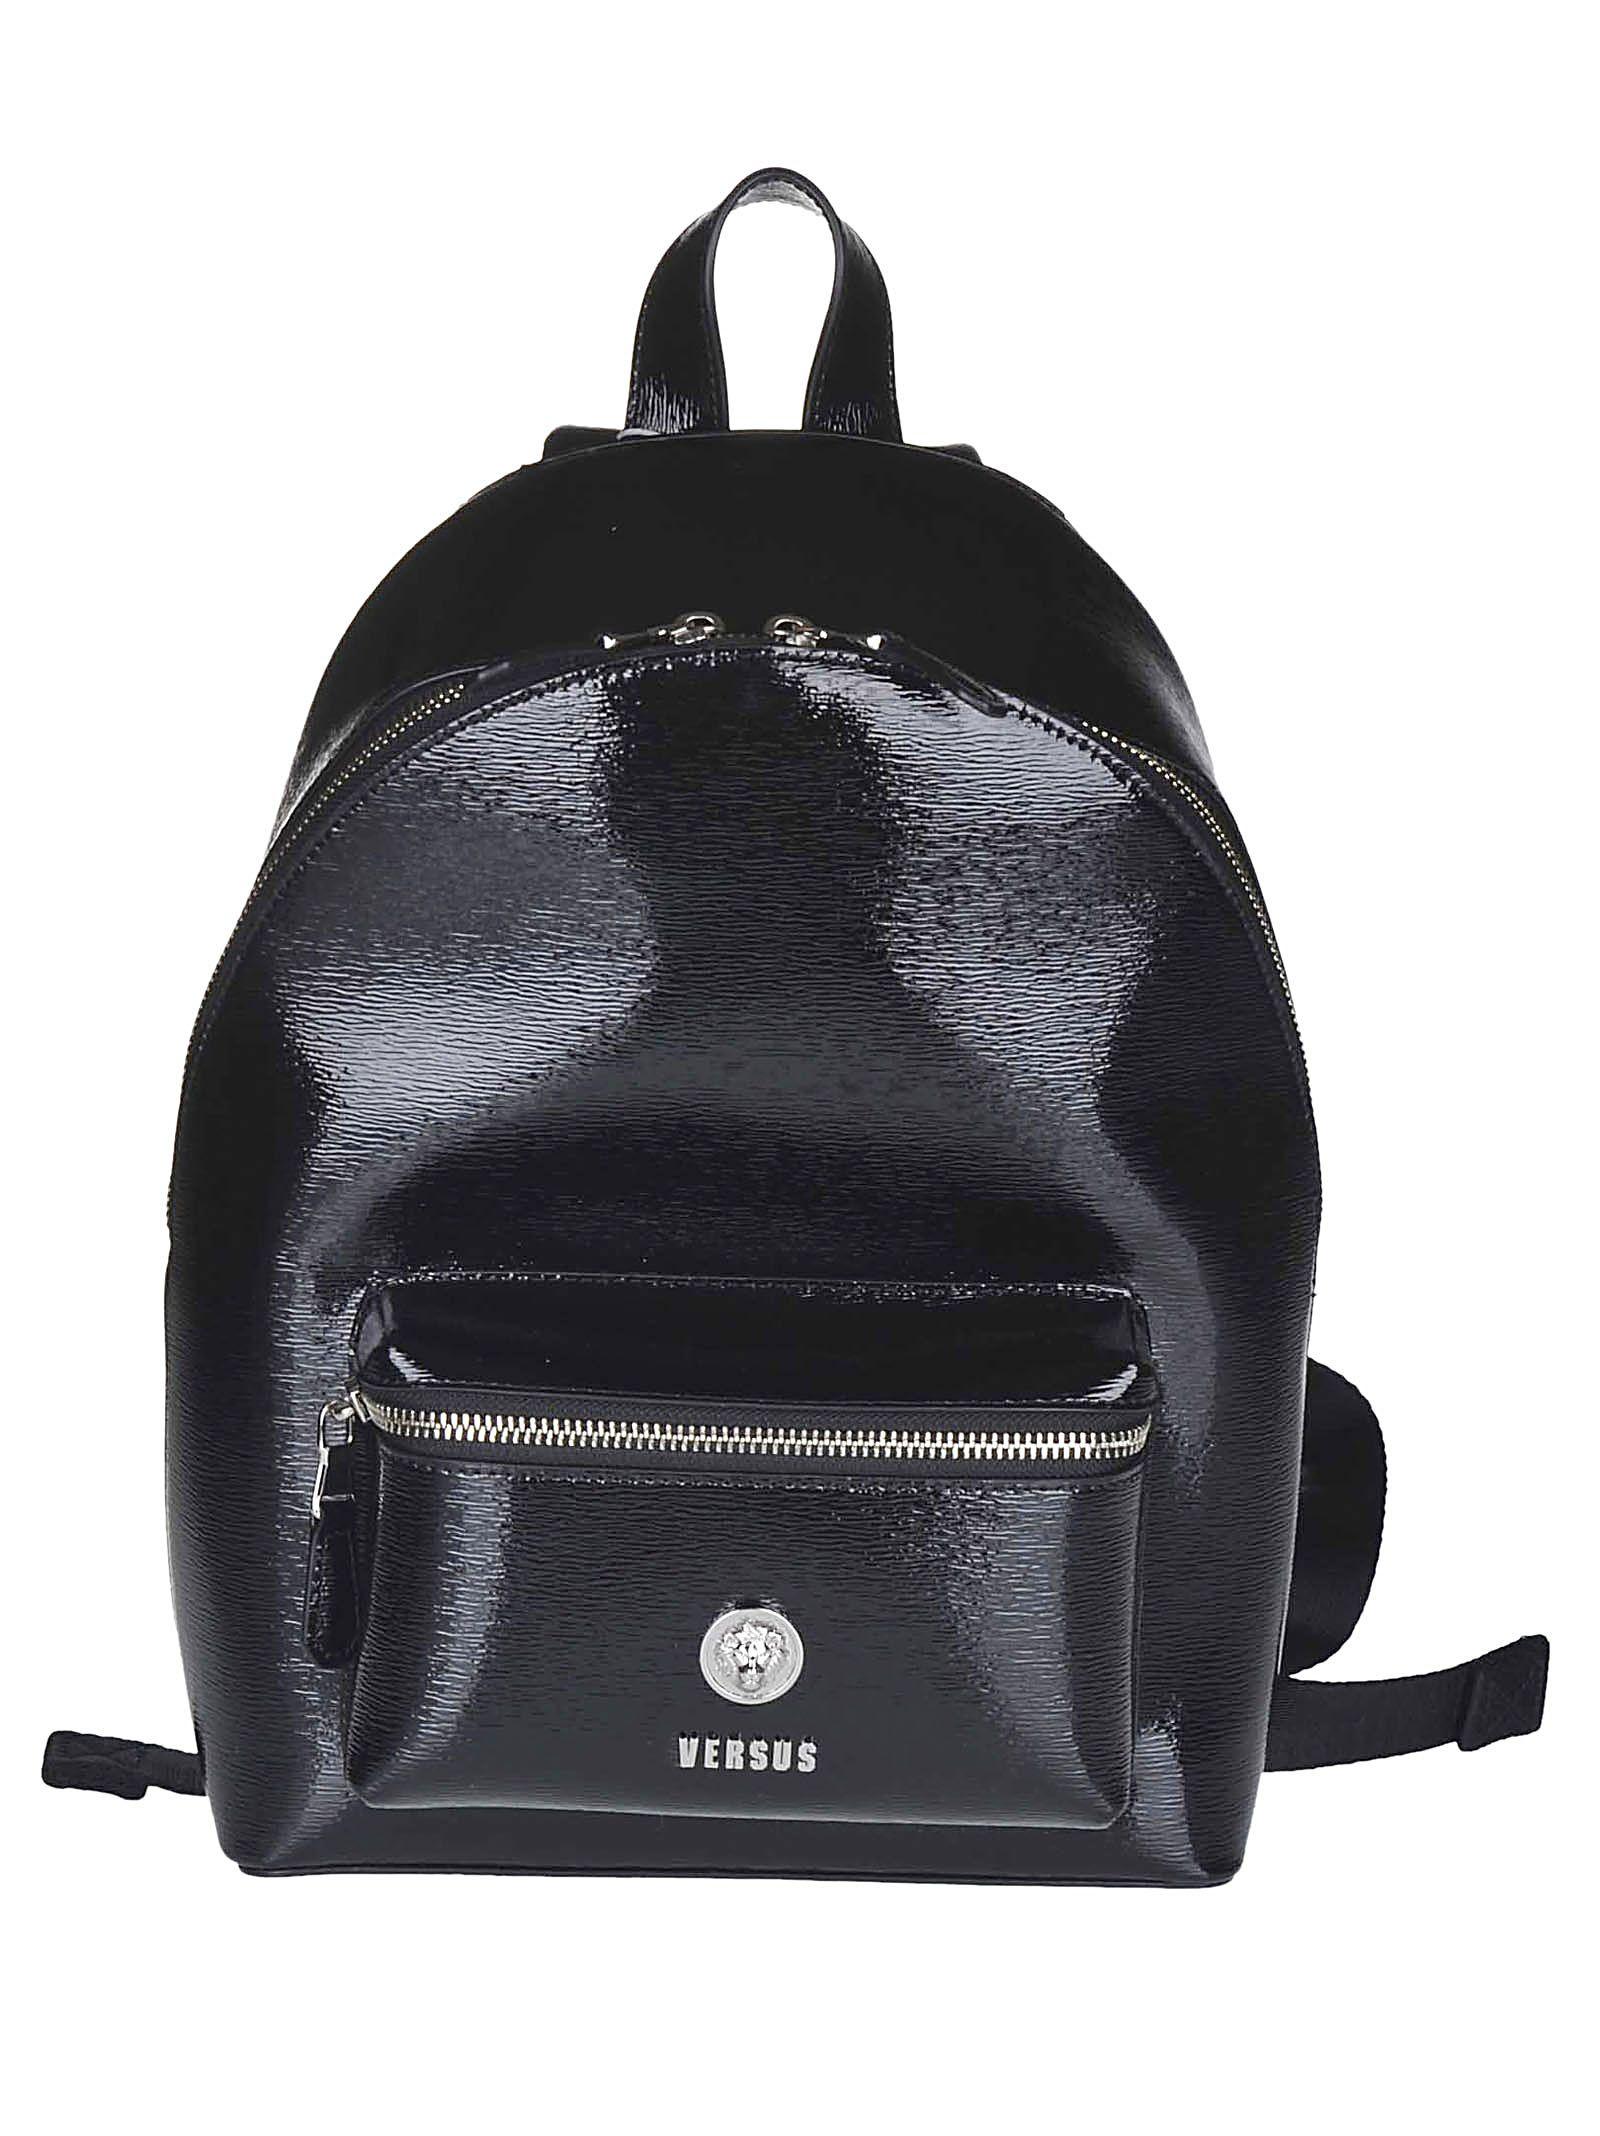 477965e33e7f Versus Versace Versus Versace Logo Plaque Backpack - Black ...